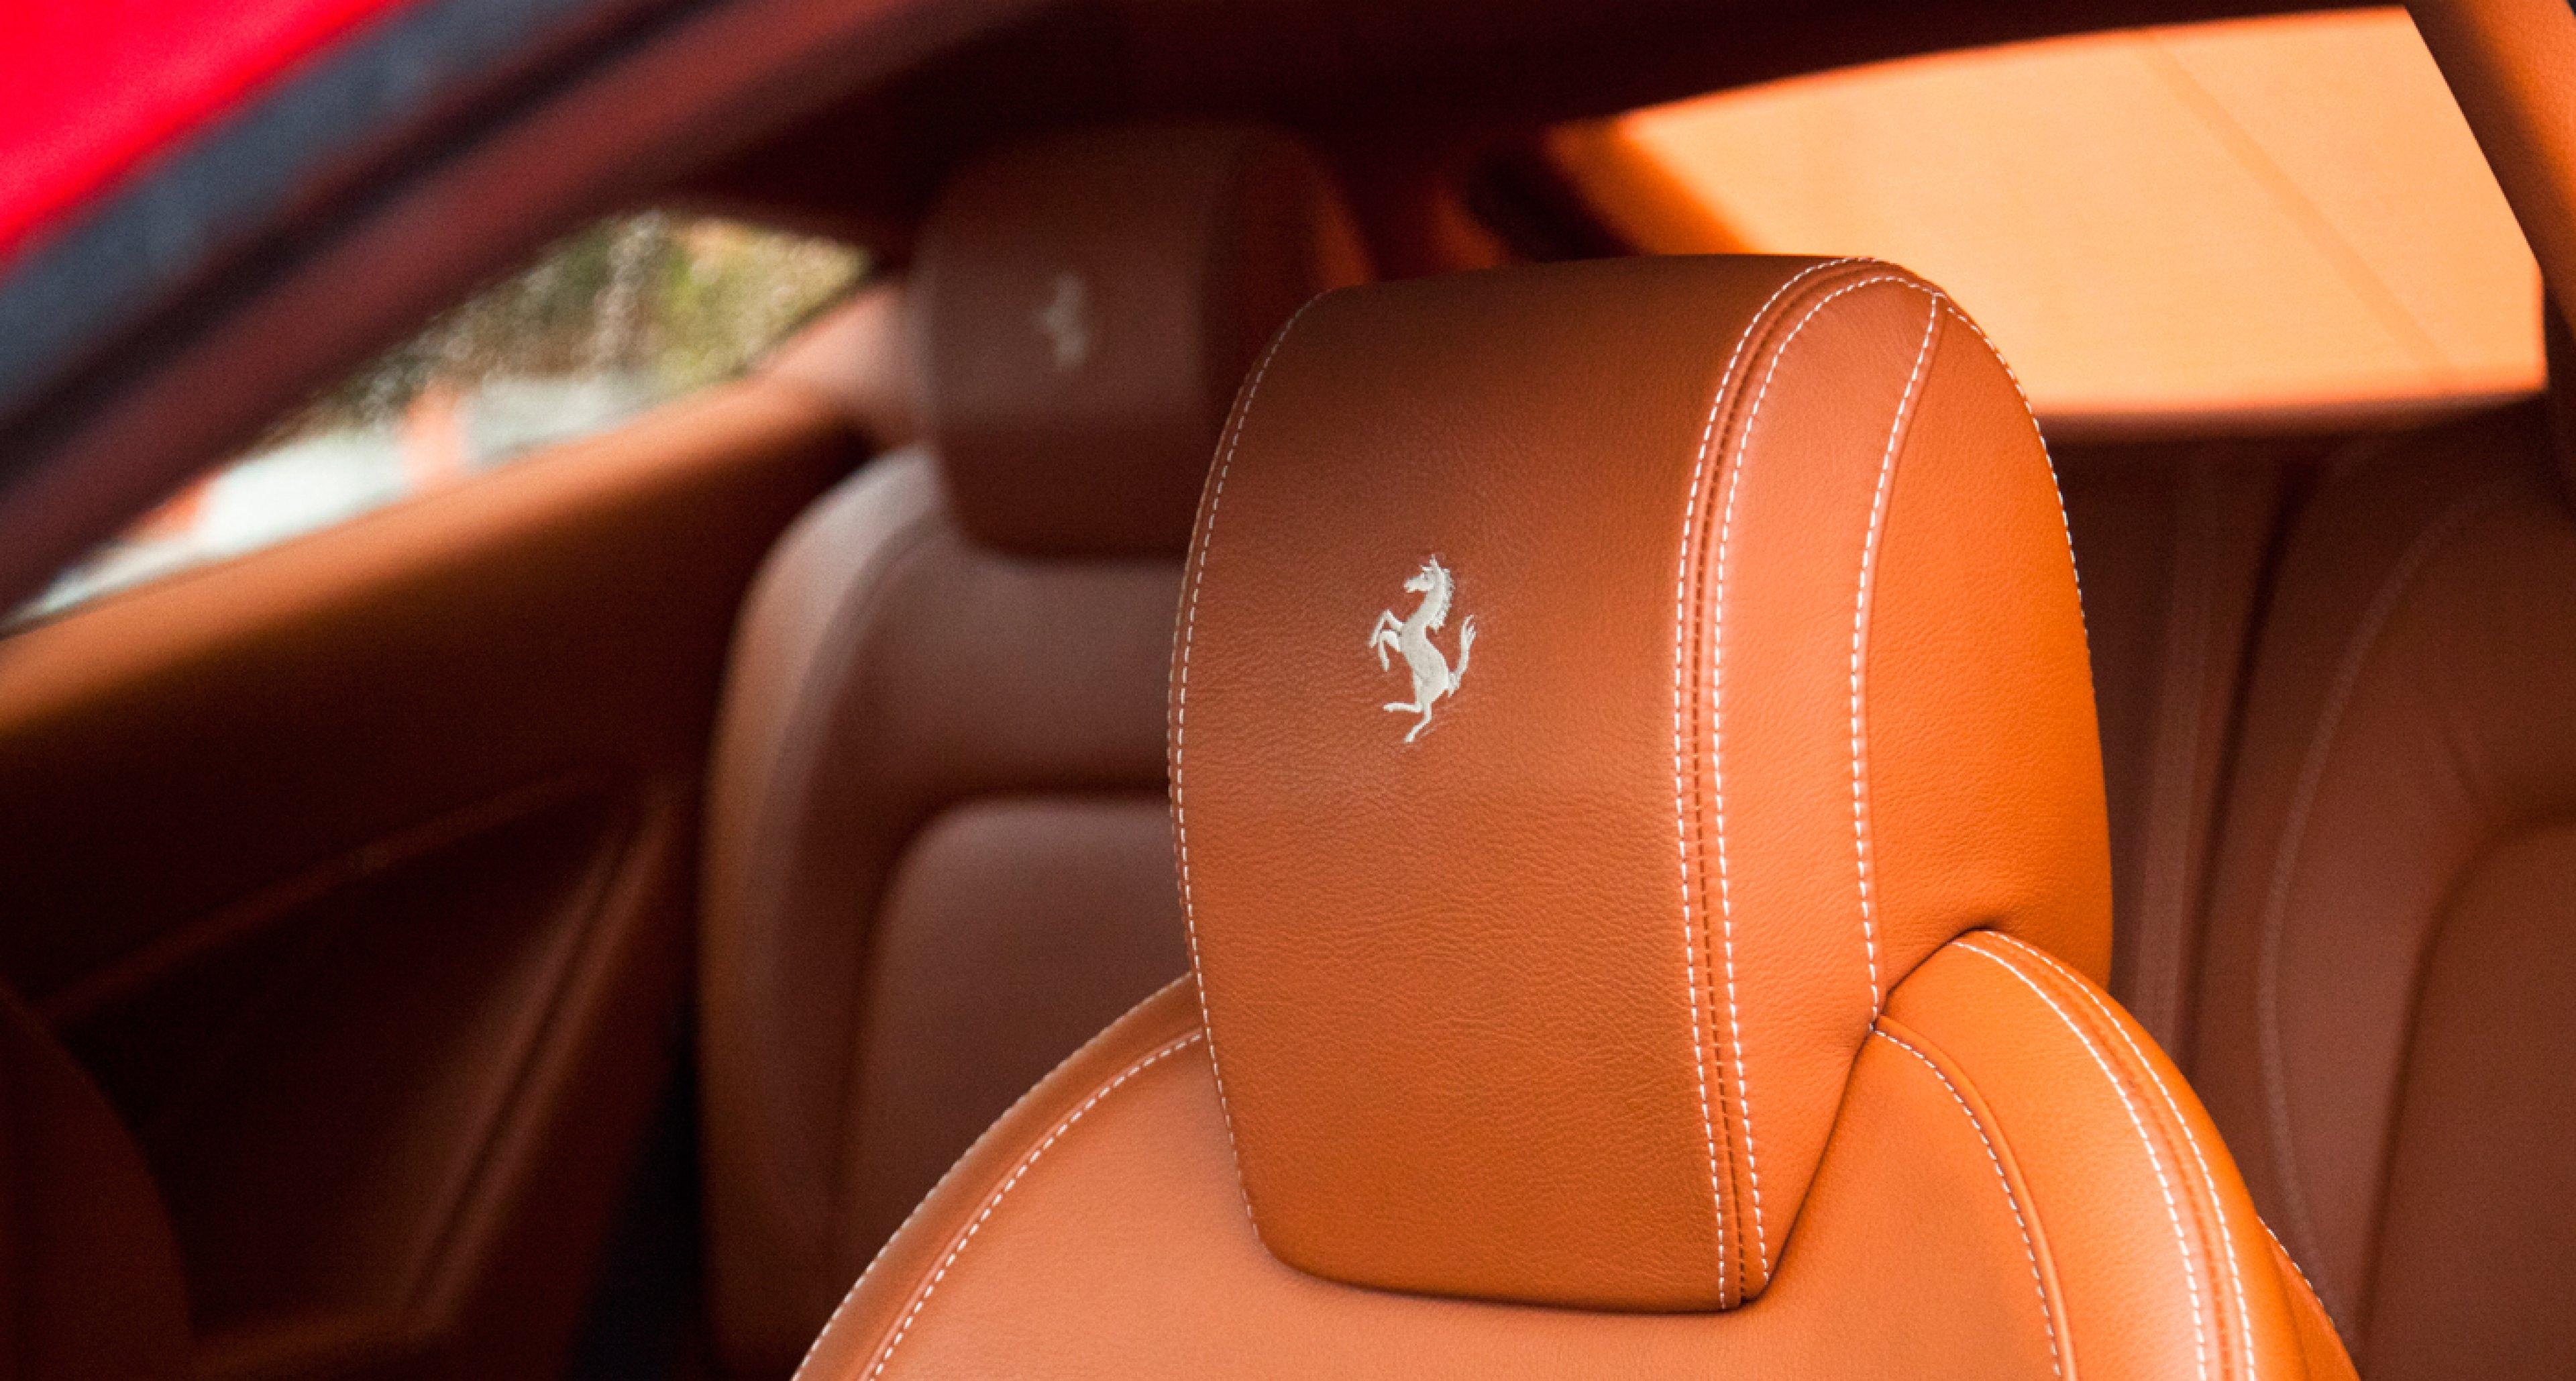 Ferrari FF with Poltrona Frau leather interior.